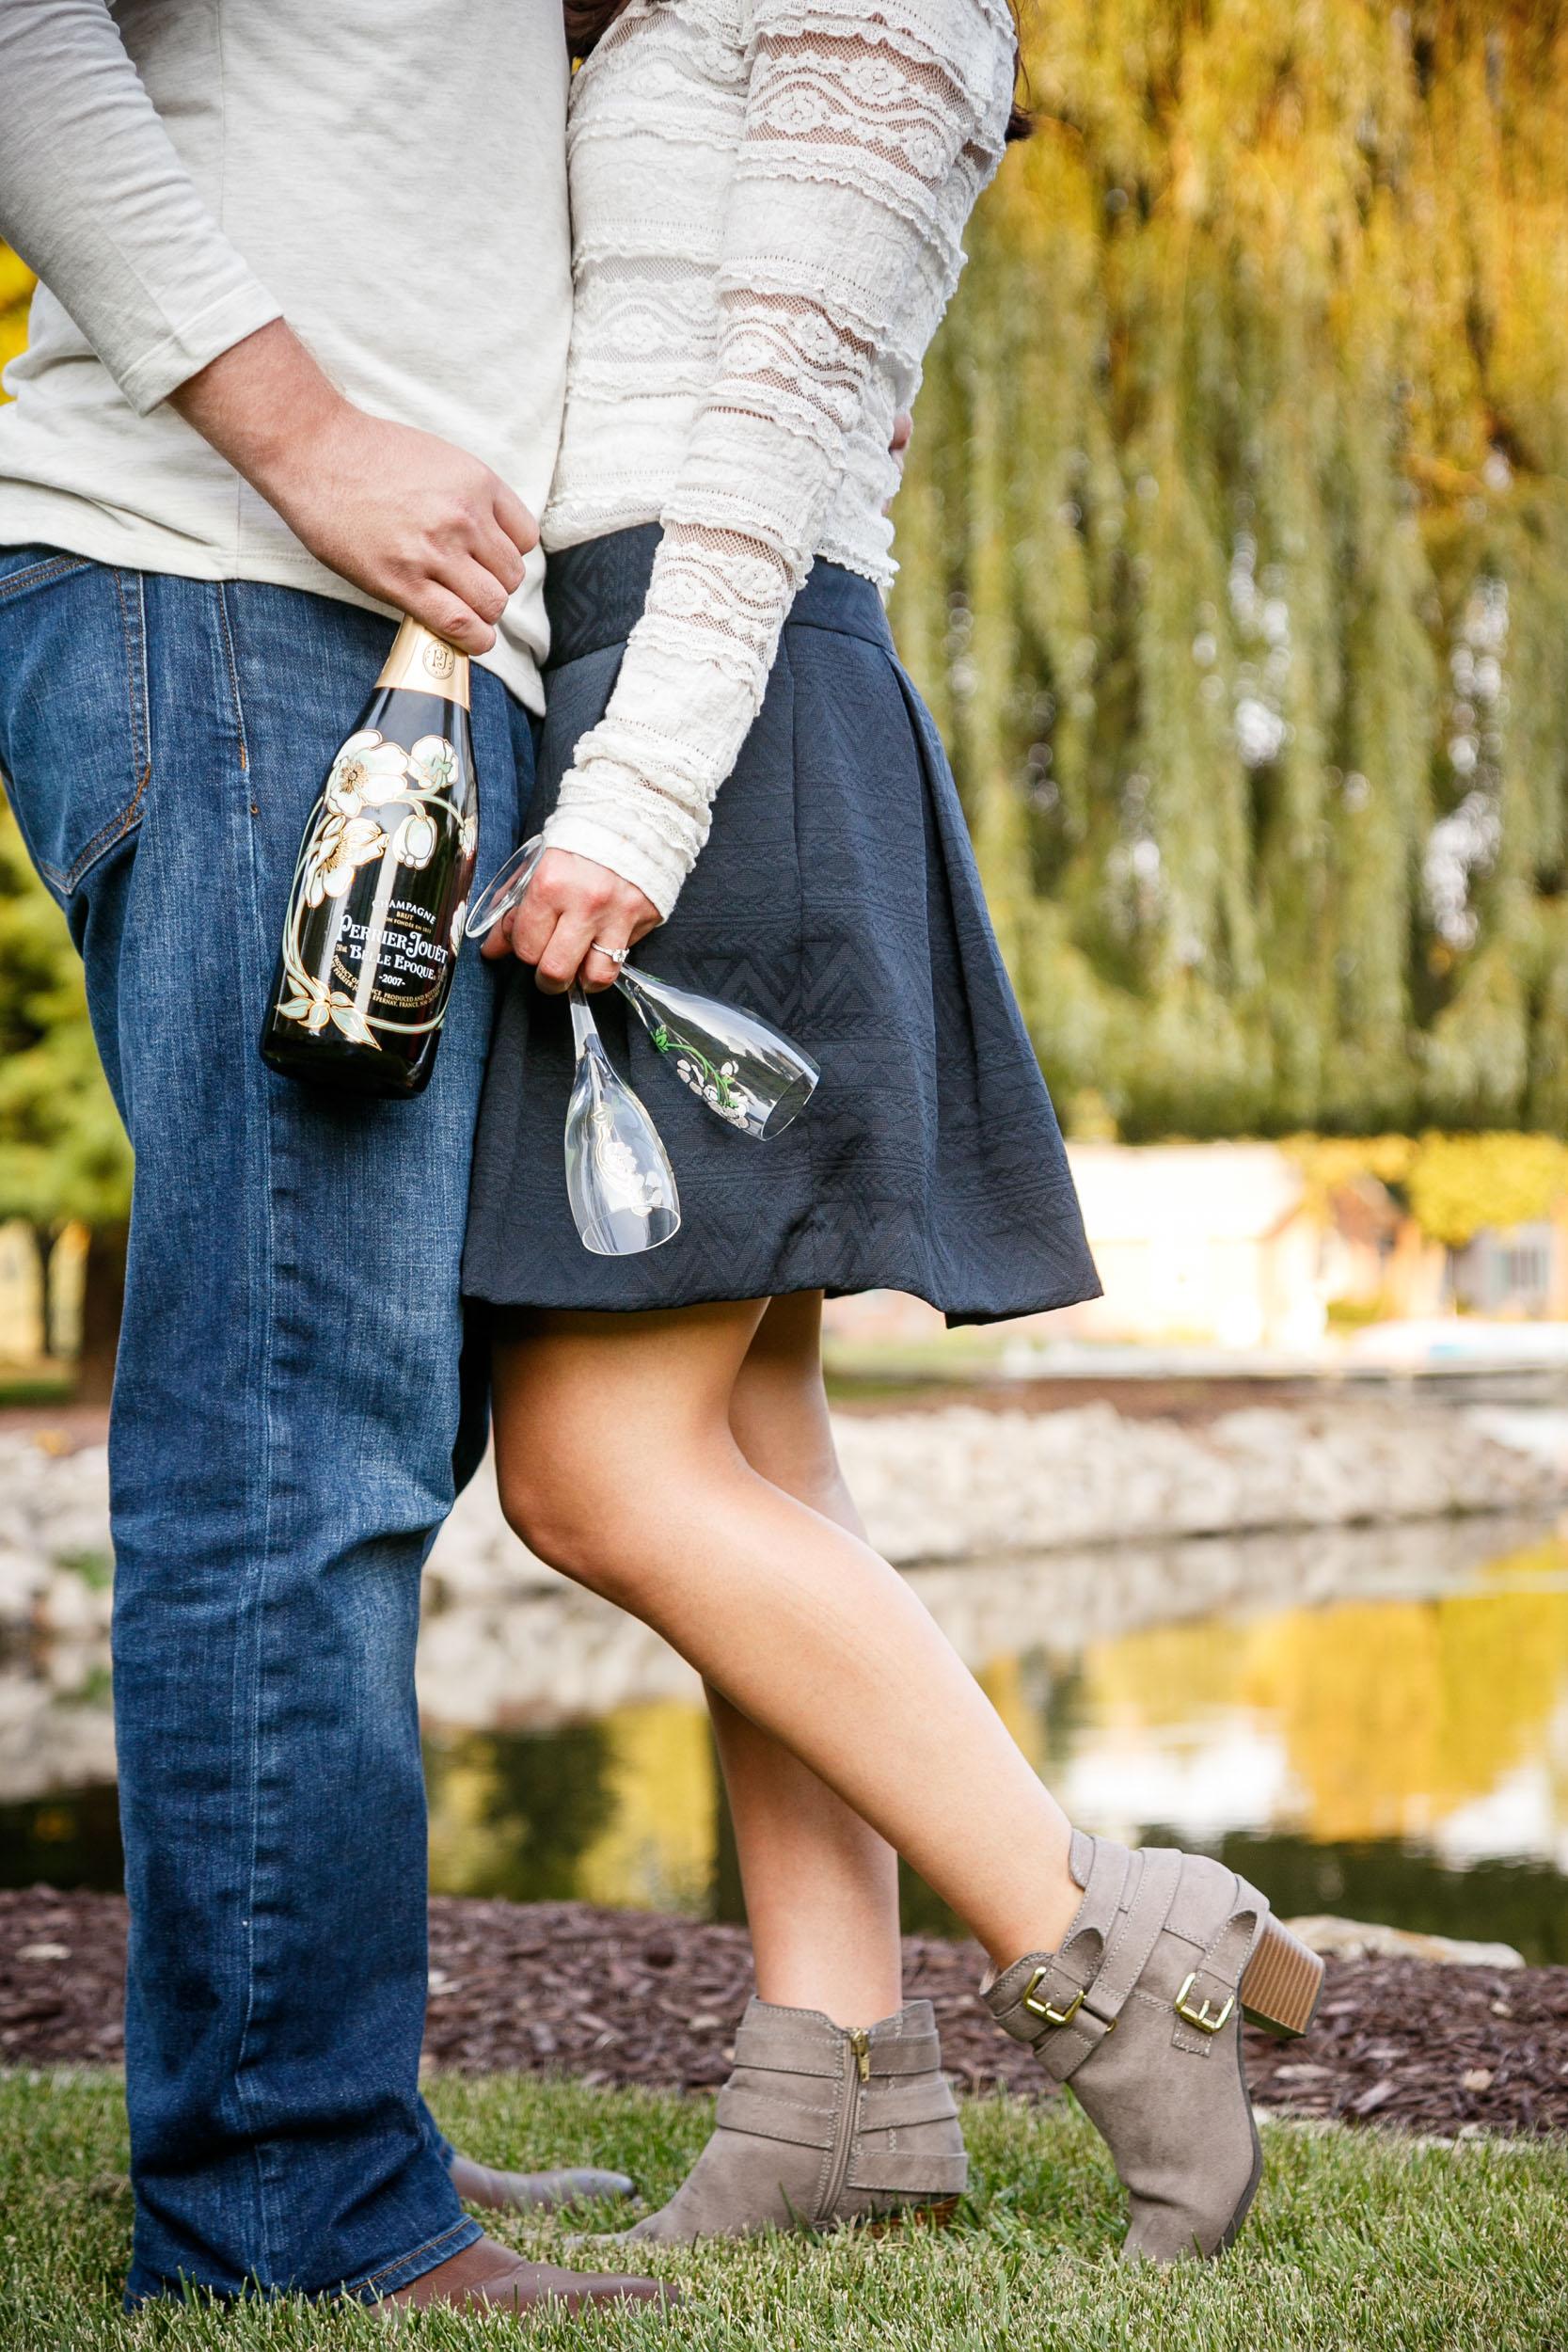 fall-engagement-photos-props--adam-shea-photography-green-bay-appleton-neenah-photographer-19.jpg